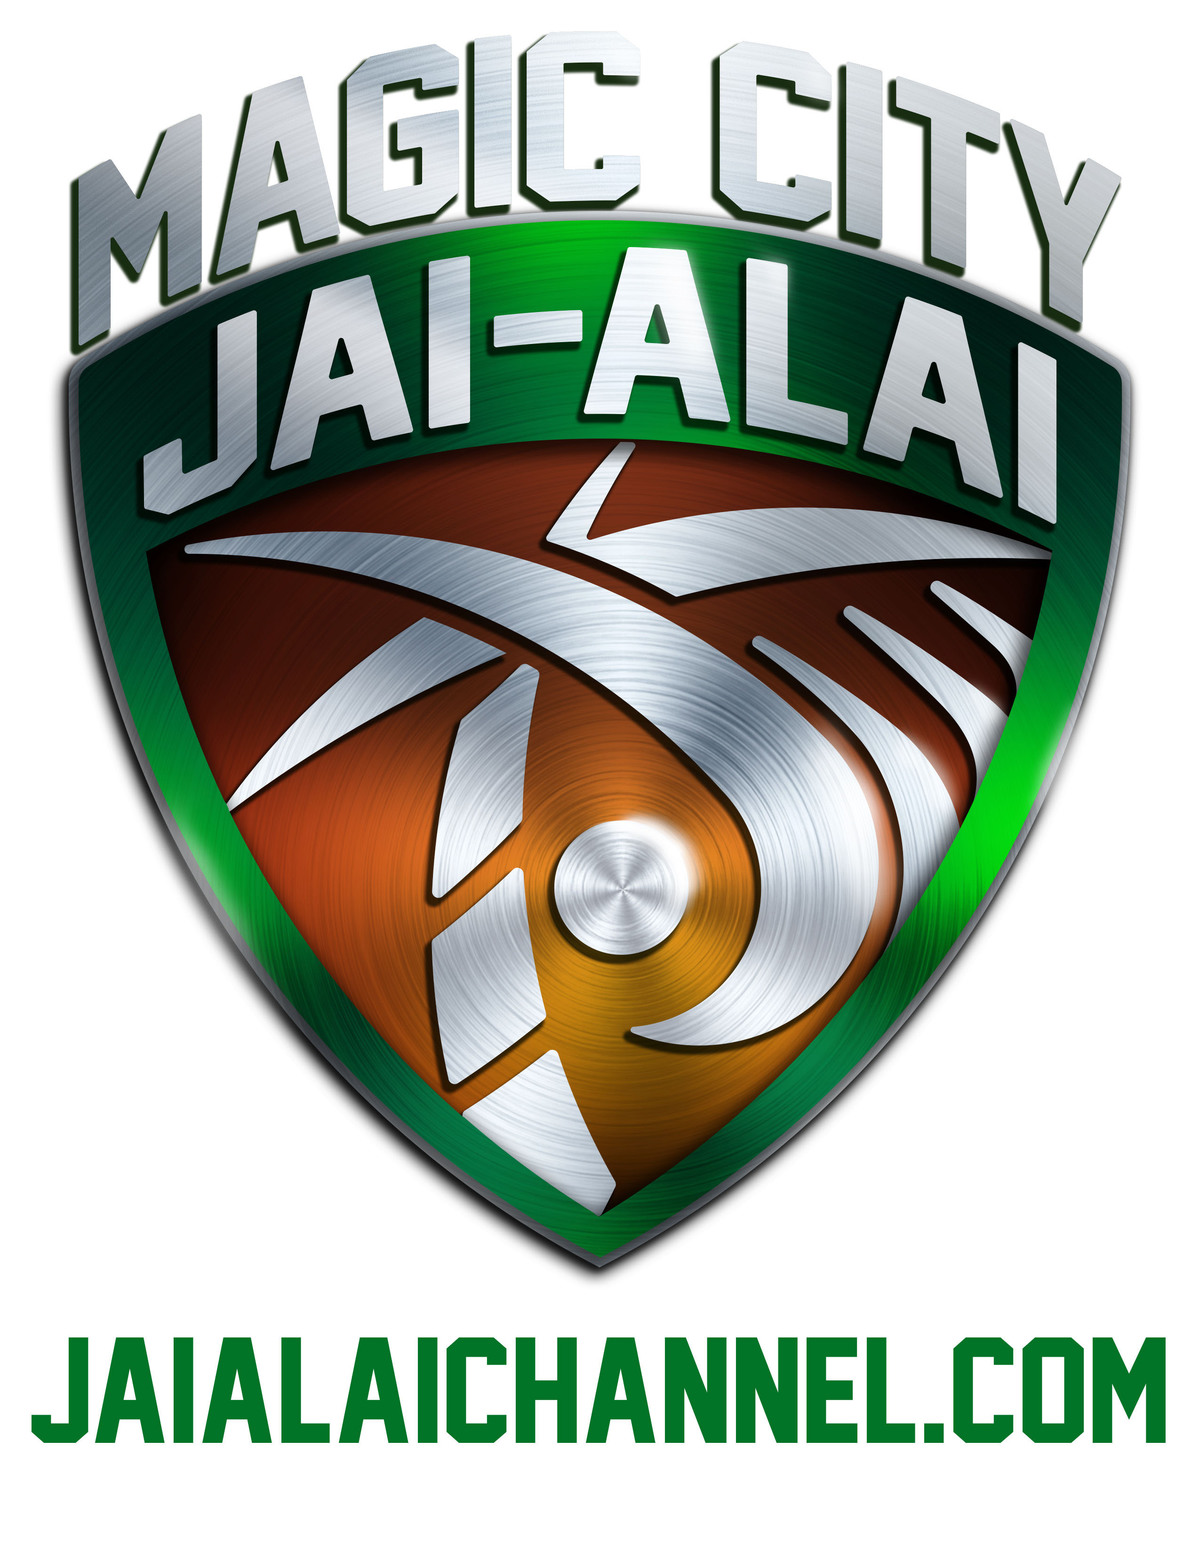 Jai-Alai H2H - Singles H2H - Mon. Jul 12, 2021